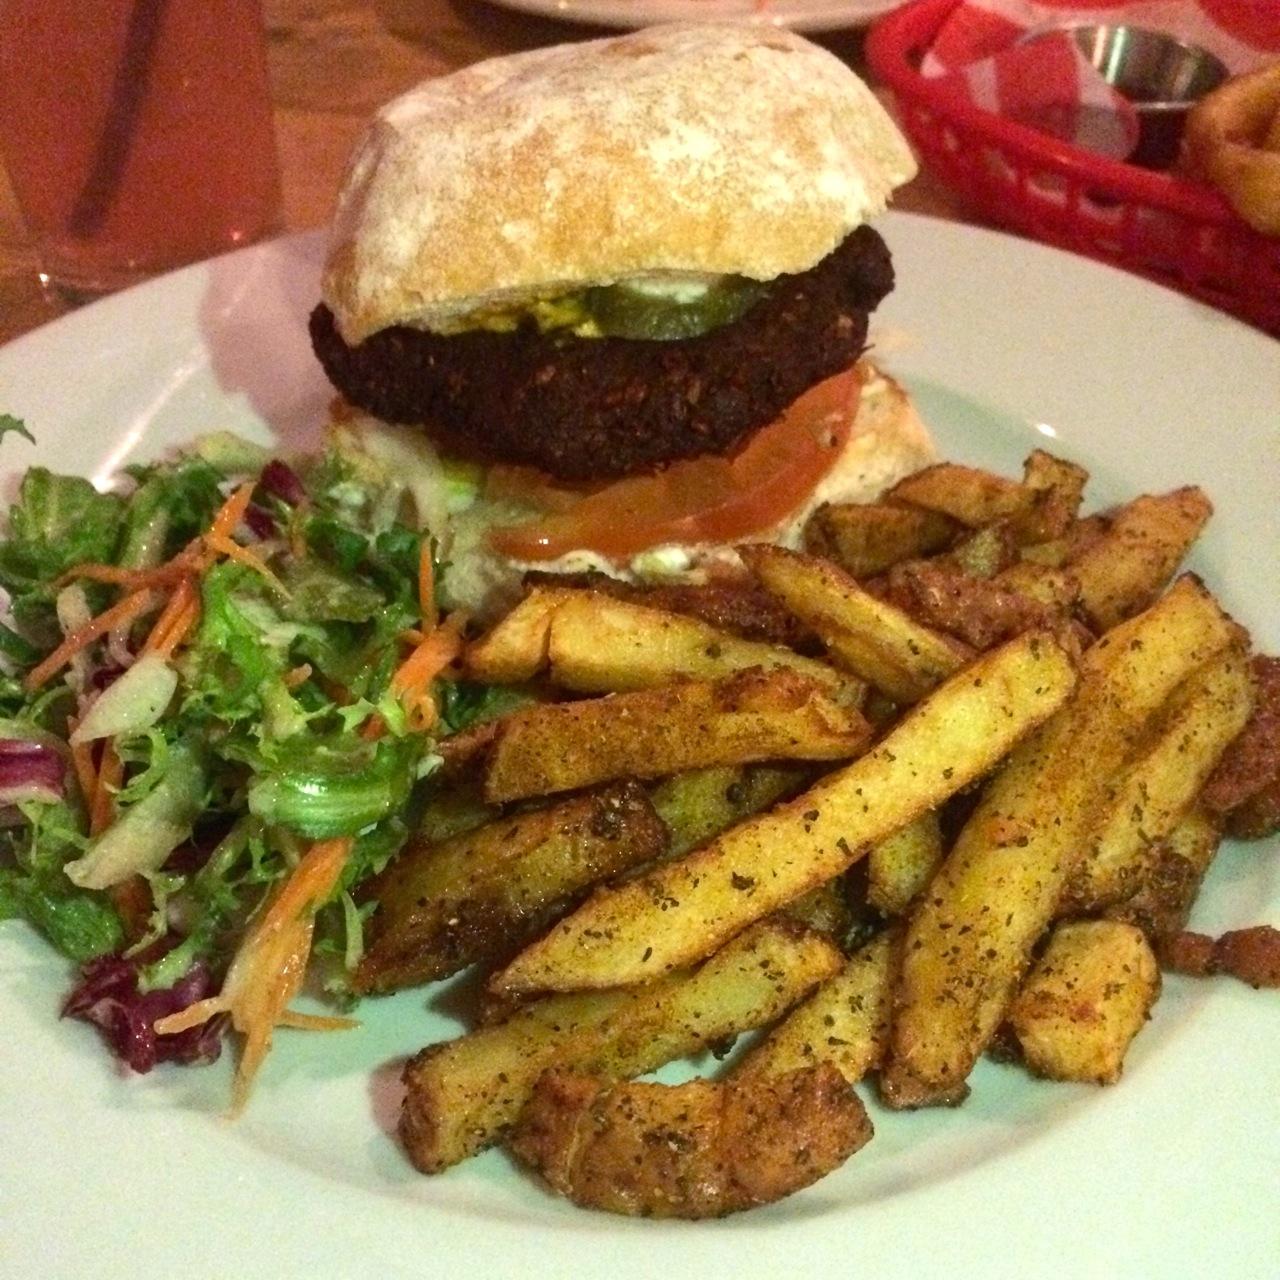 http://i1.wp.com/fatgayvegan.com/wp-content/uploads/2015/12/burger-and-chips.jpg?fit=1280%2C1280